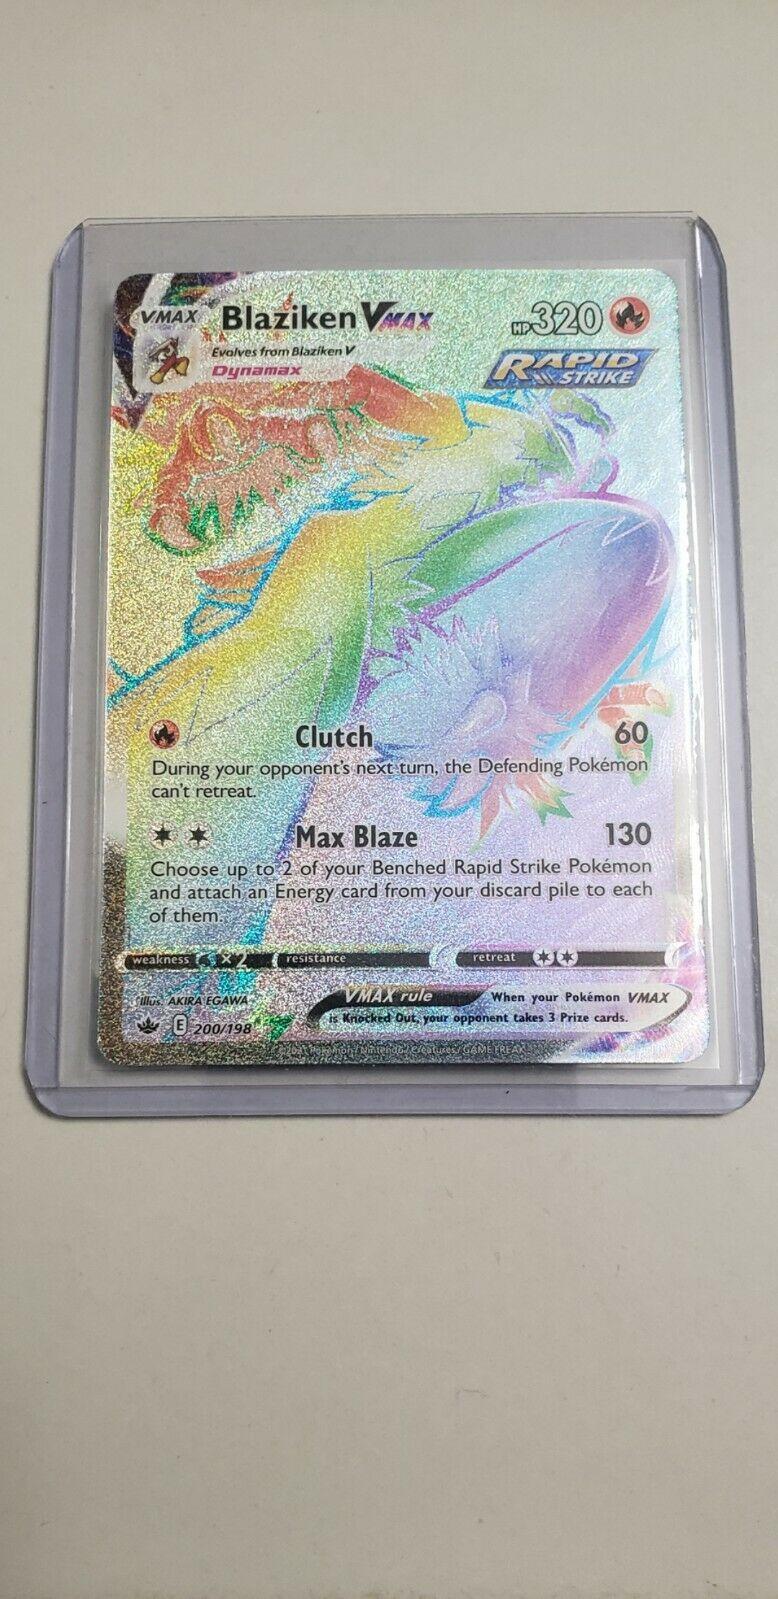 Rainbow Blaziken VMAX Pokemon Chilling Reign Card 200/198 Mint Condition